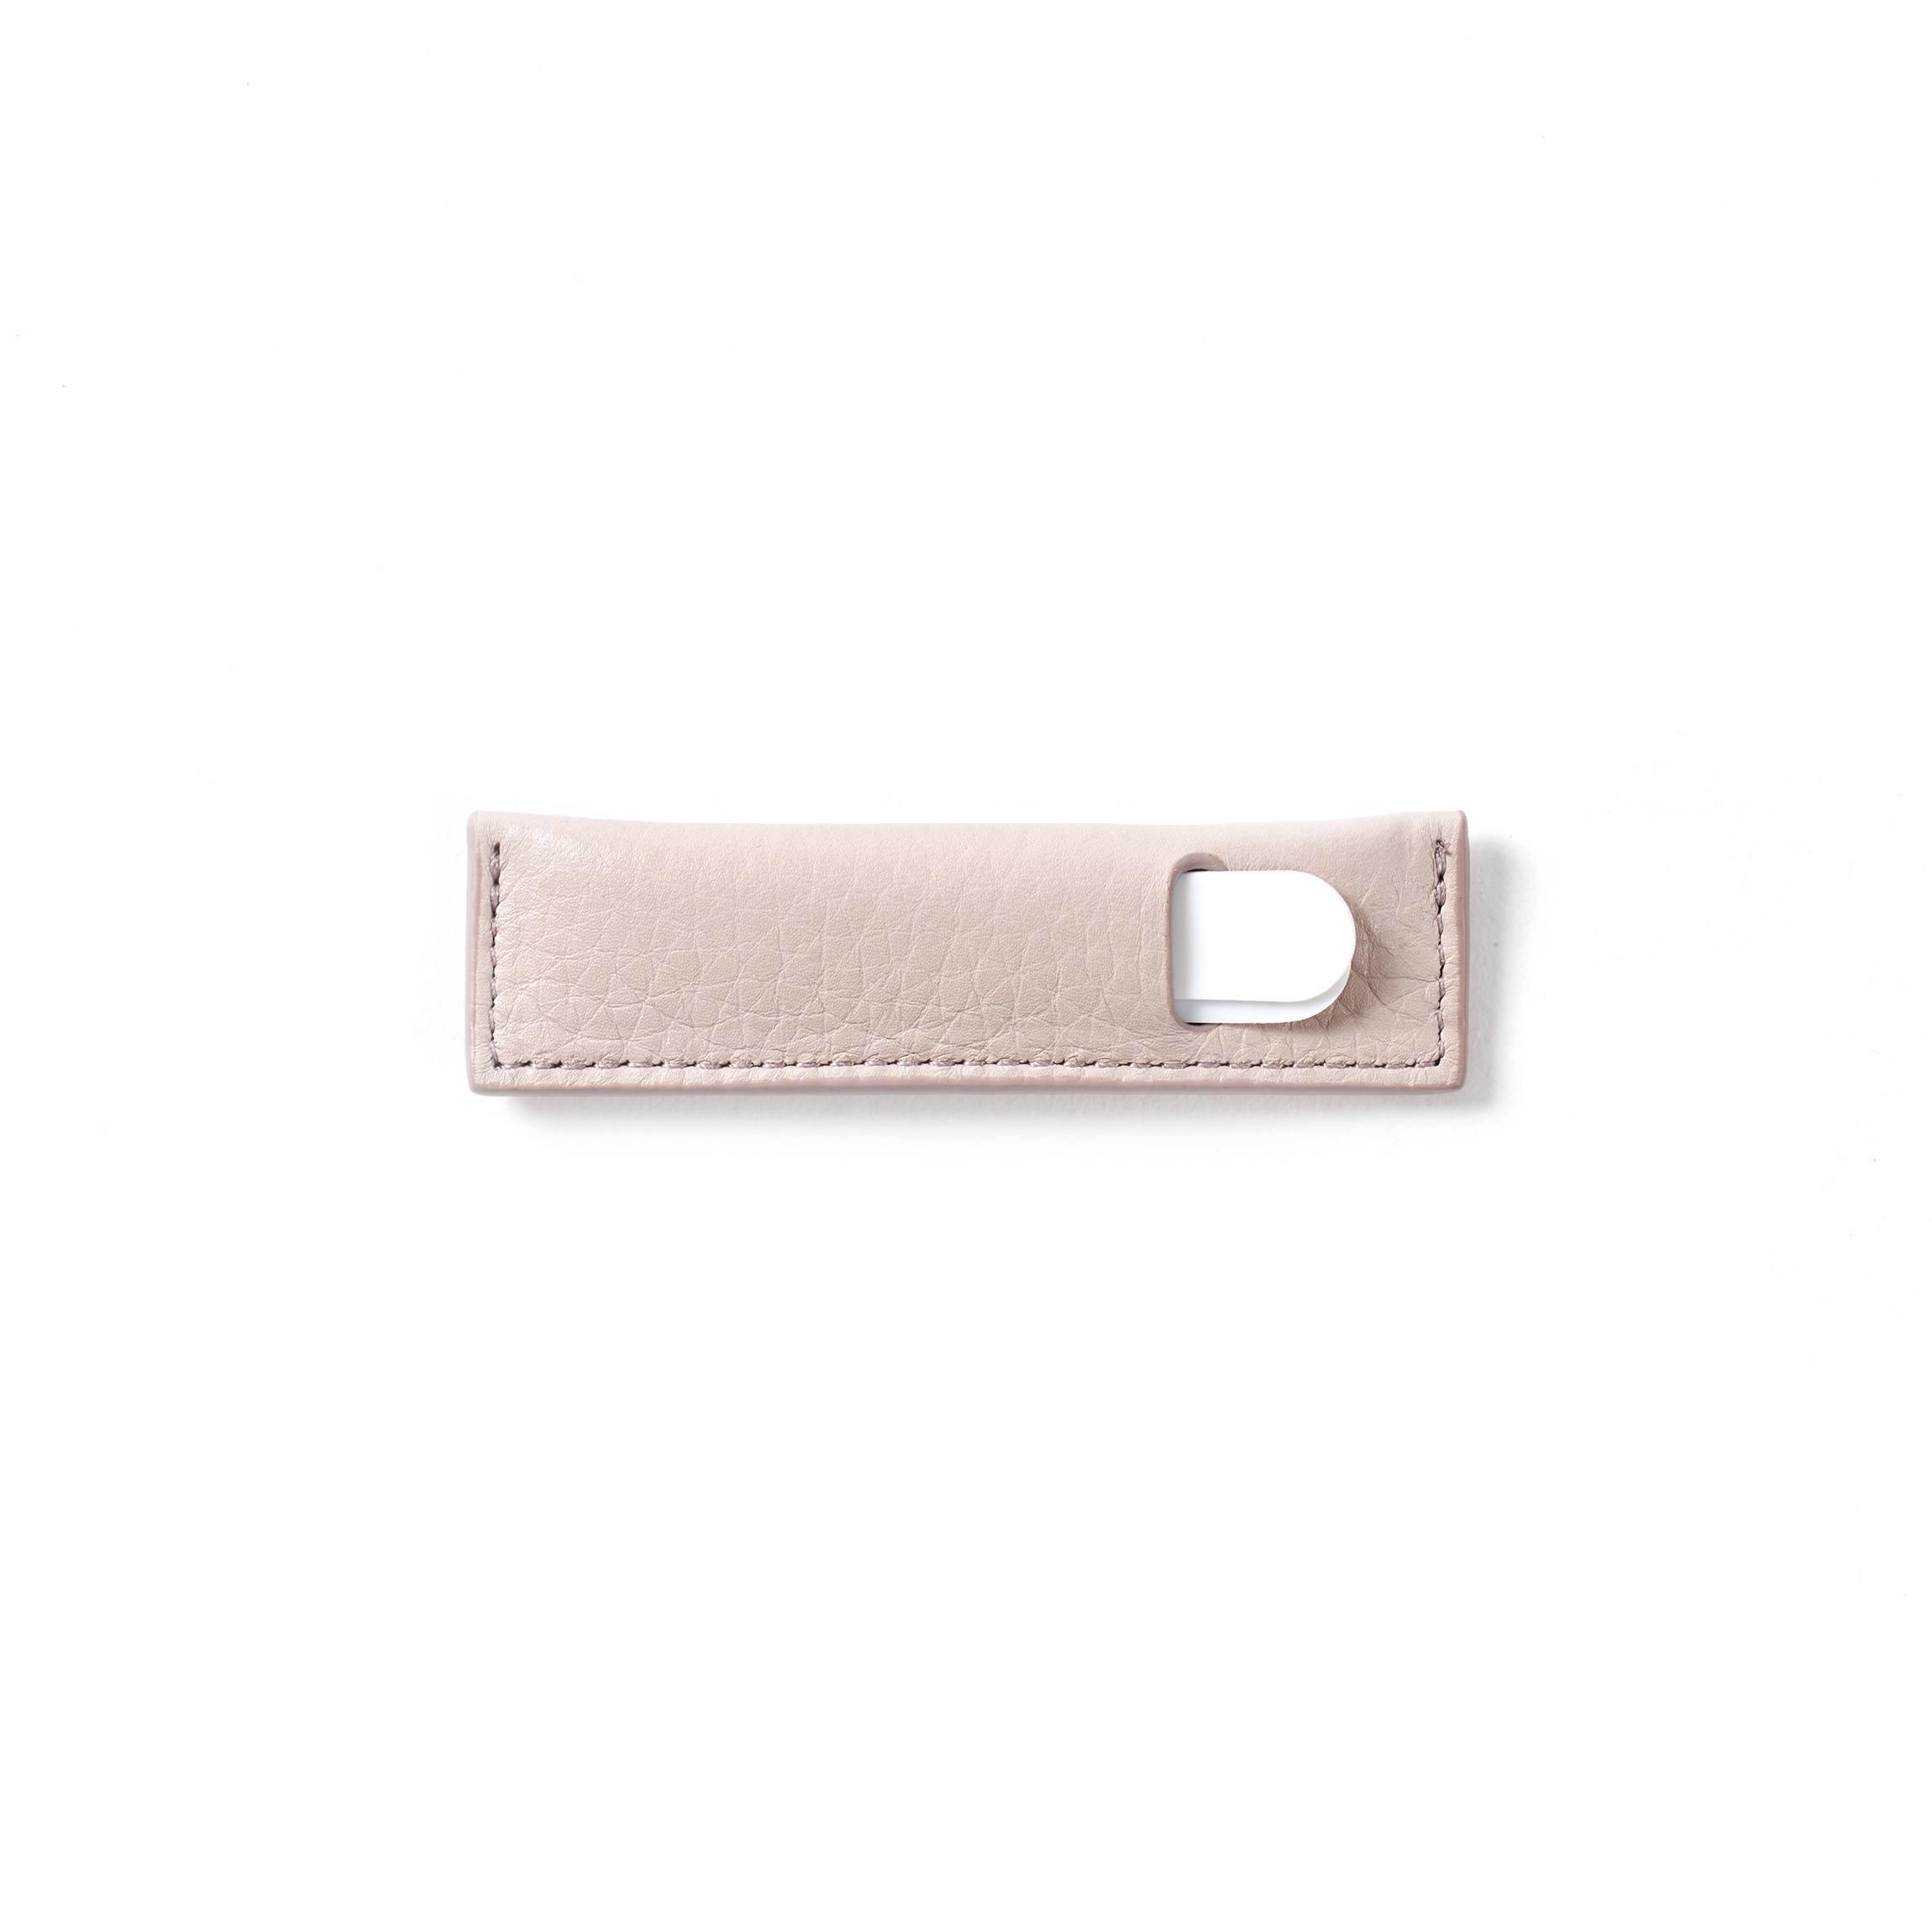 Collar Stay Case - Full Grain Leather - Stone (gray)